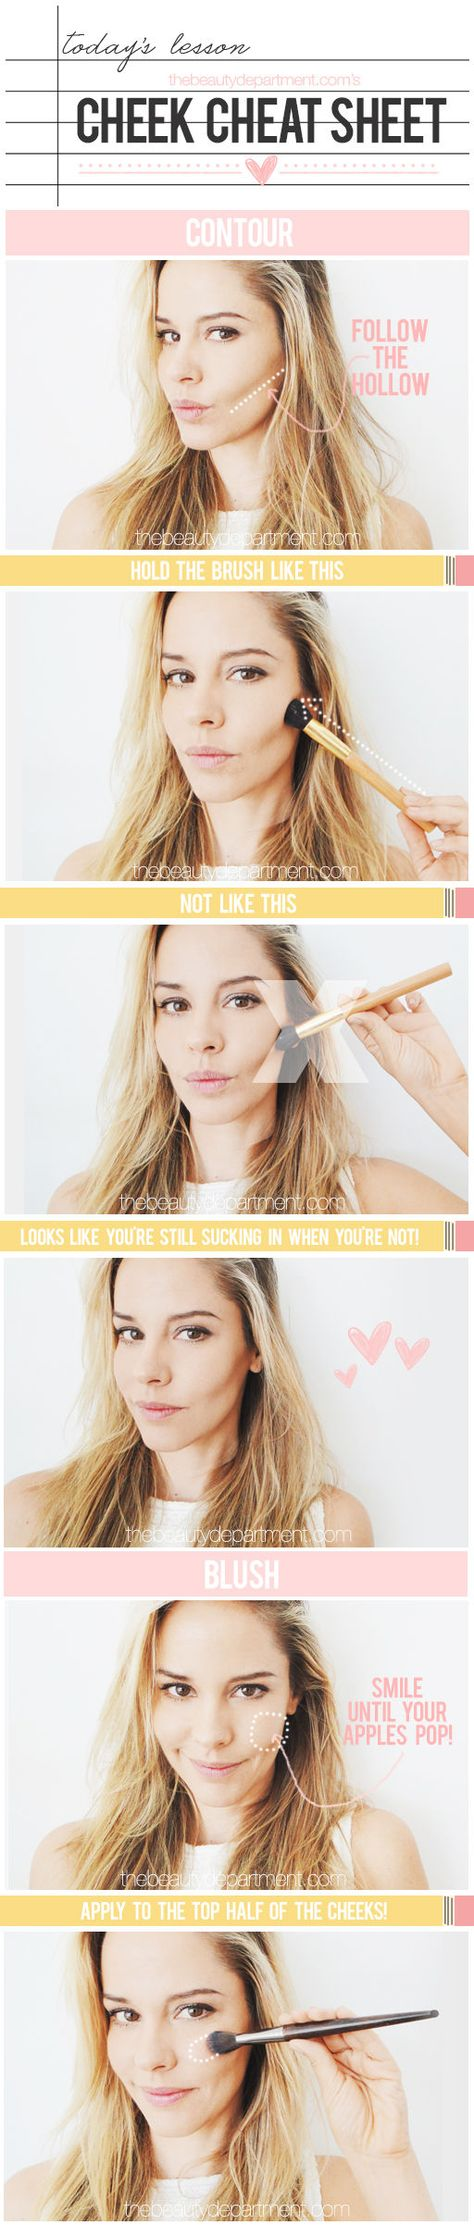 Cheek cheat sheet. First step: Make sure your cosmetics are cruelty-free! #BeCrueltyFree